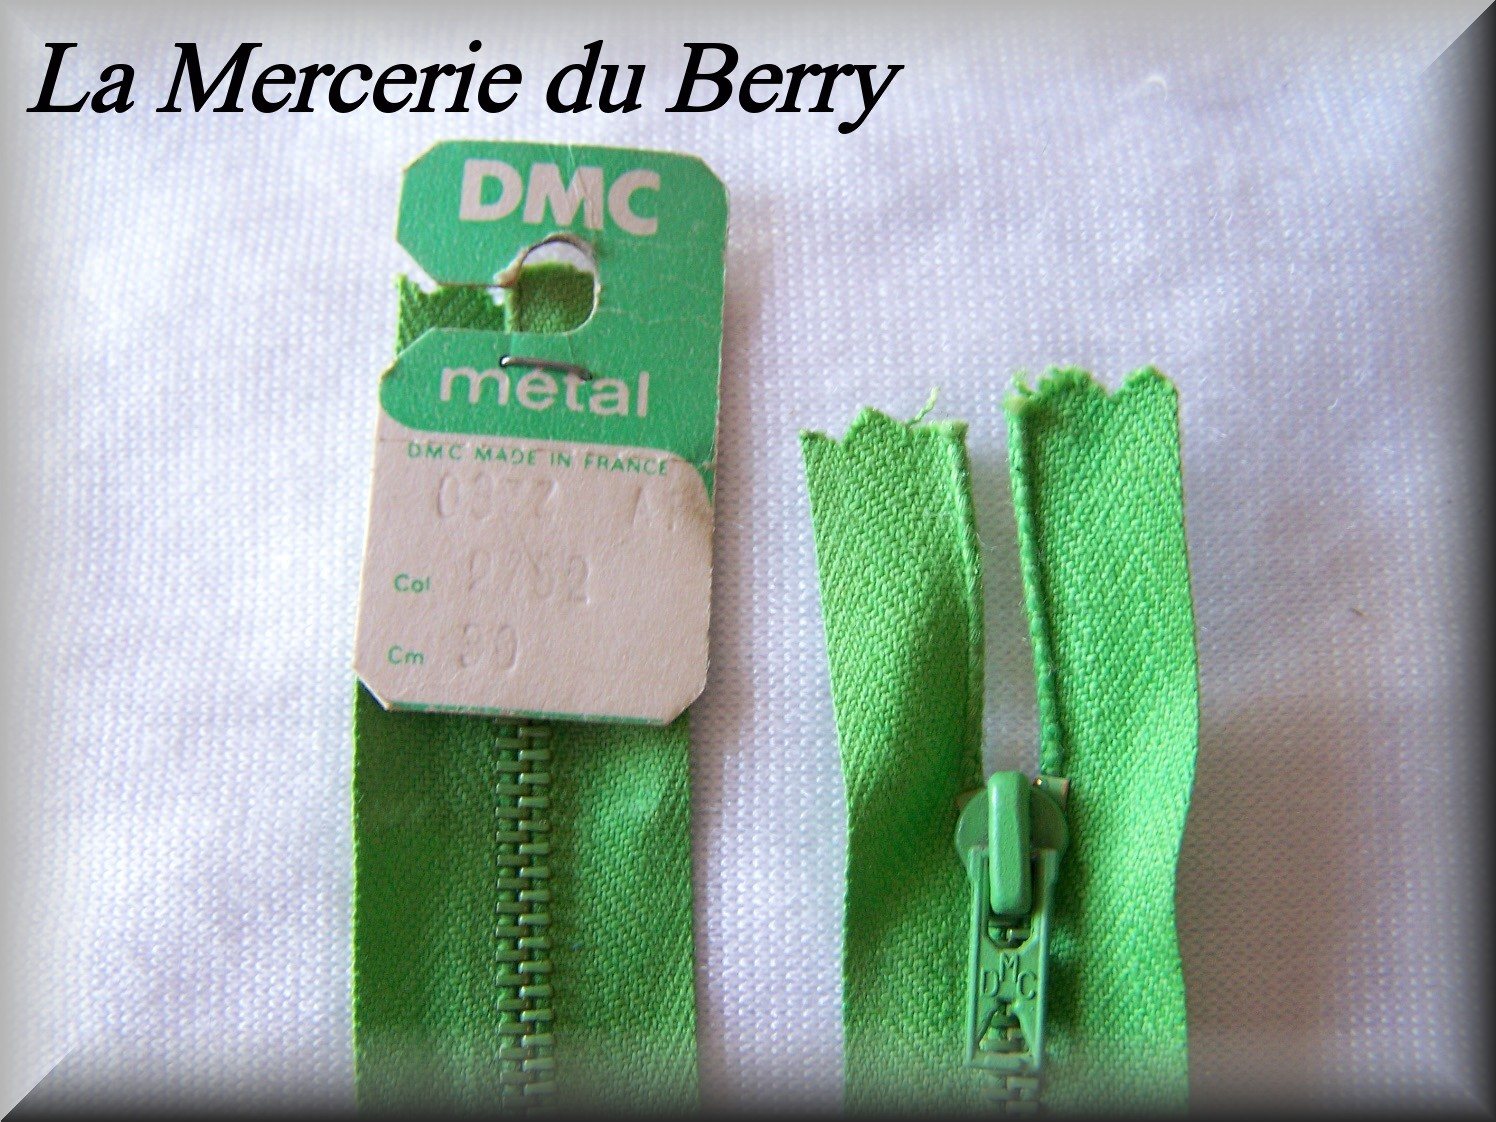 Fermeture éclair, métal, vert billard